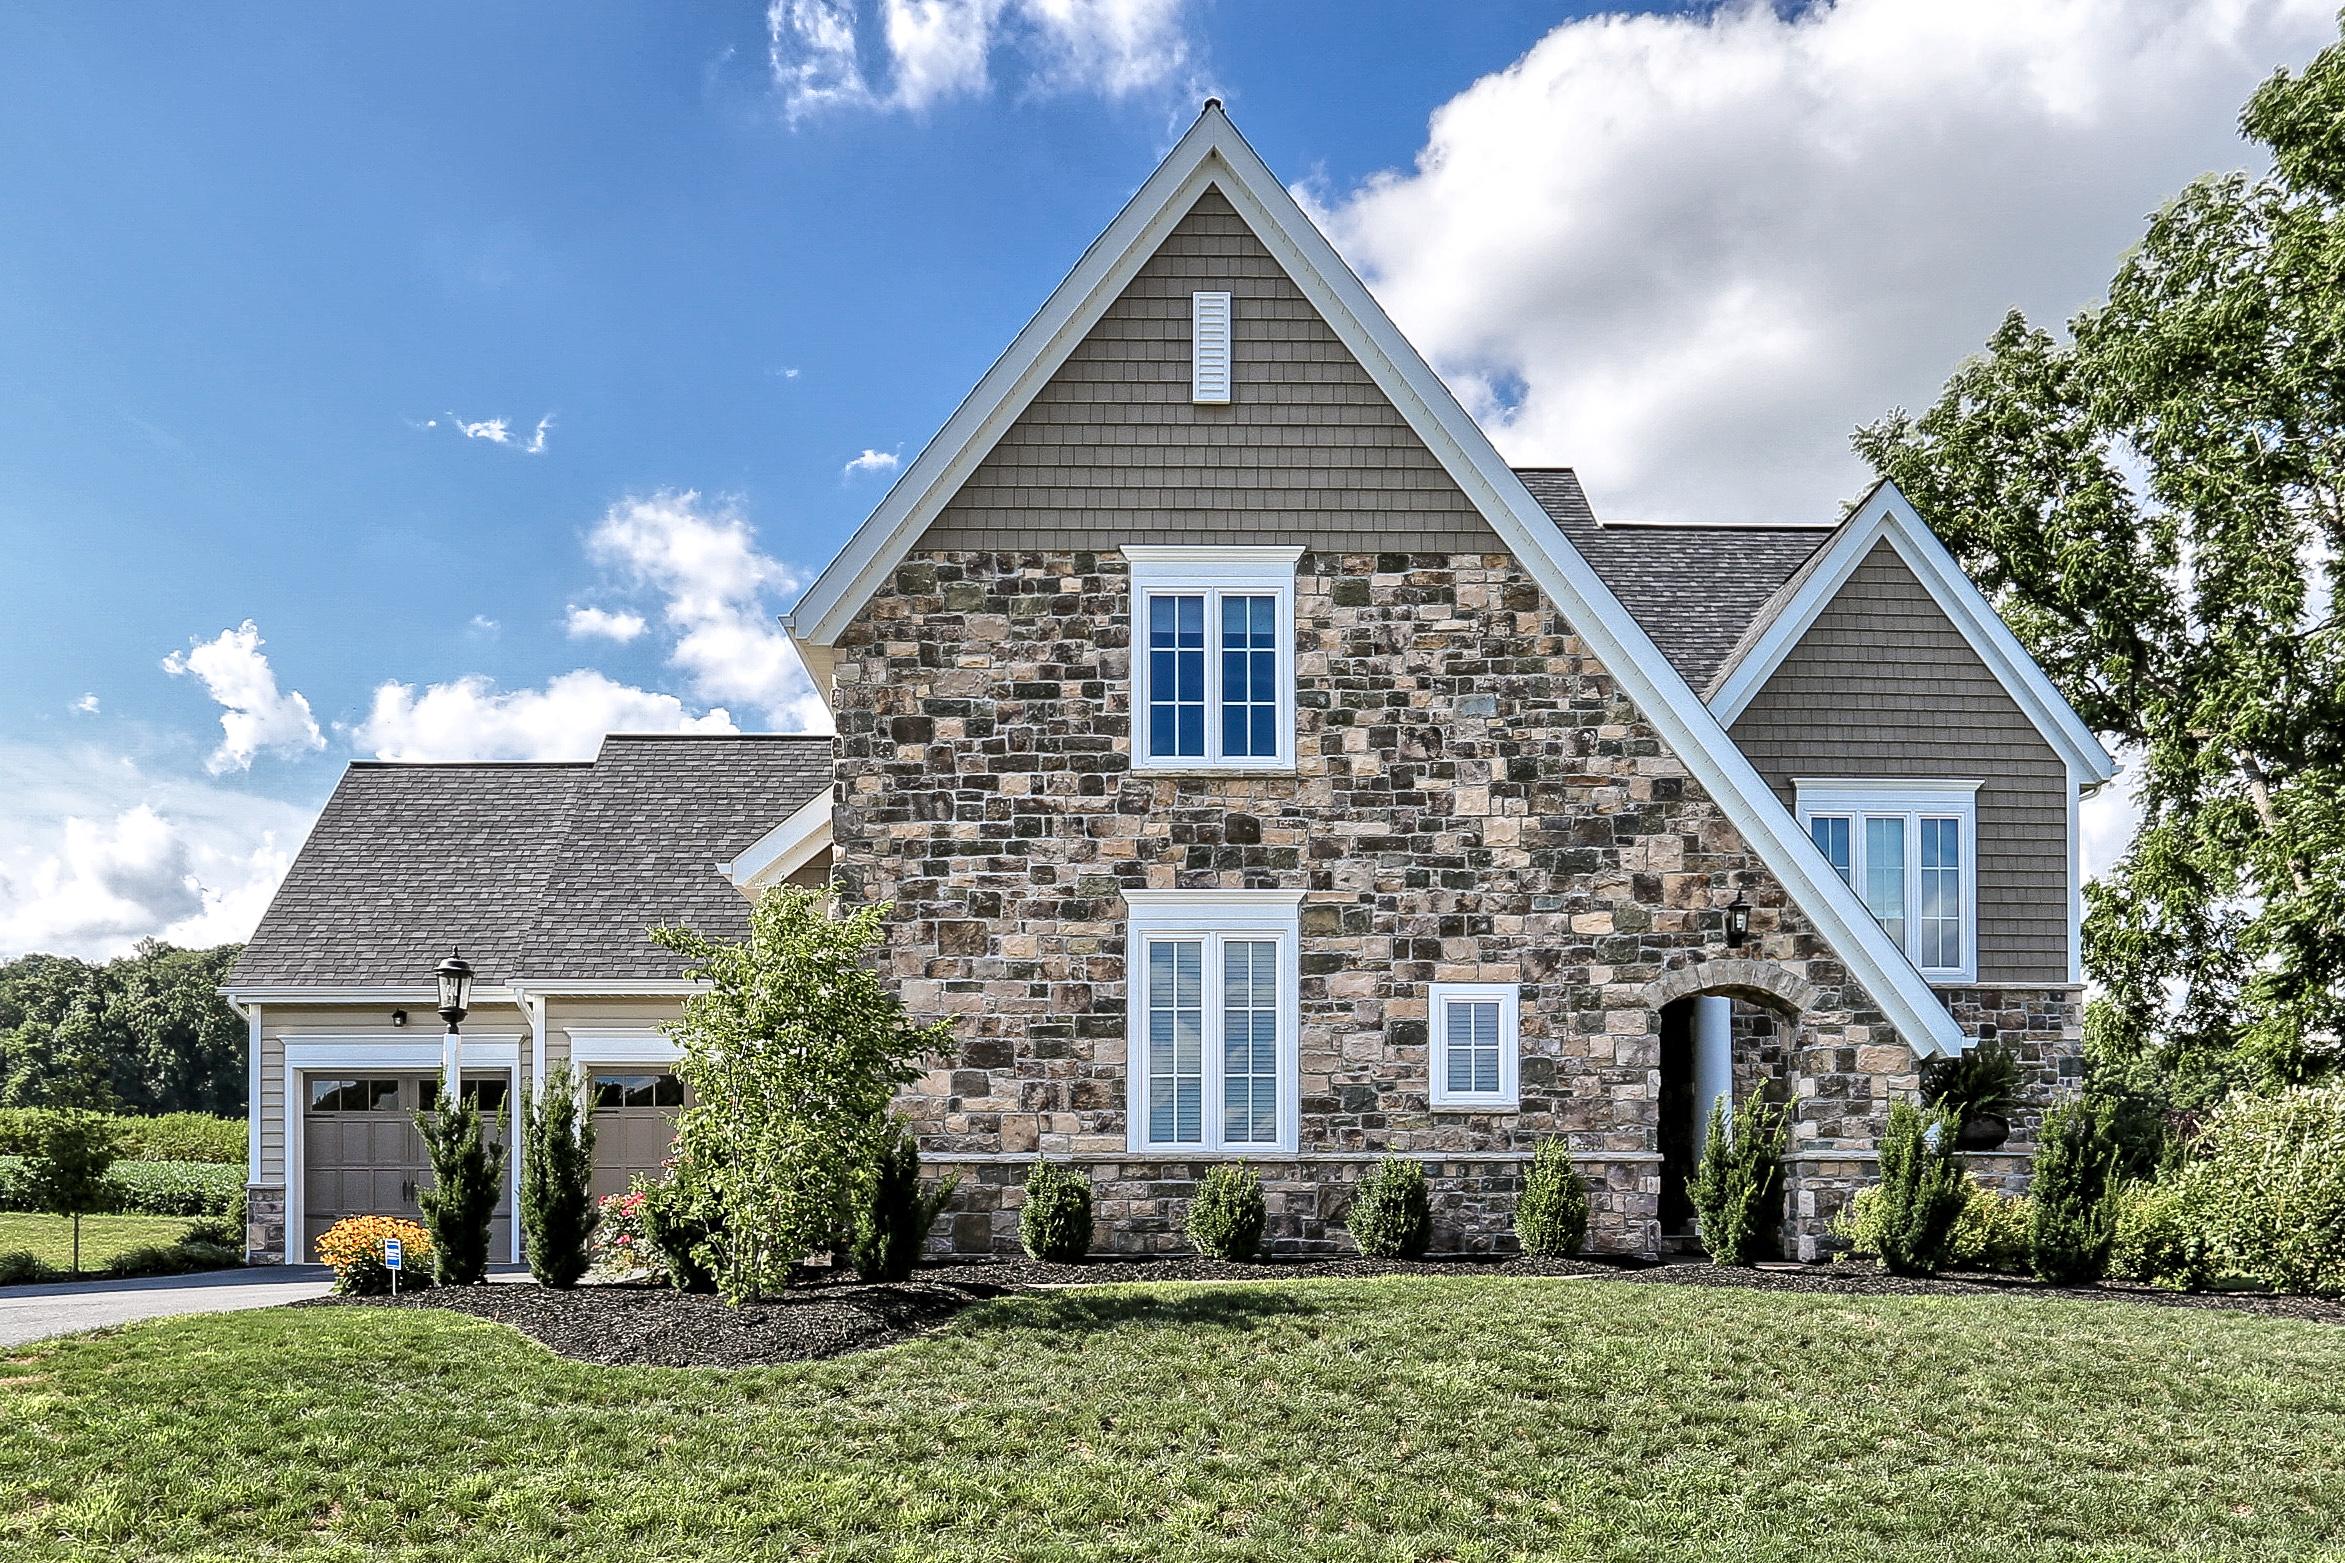 Single Family Home for Sale at 519 E Delp Road Lancaster, Pennsylvania 17601 United States